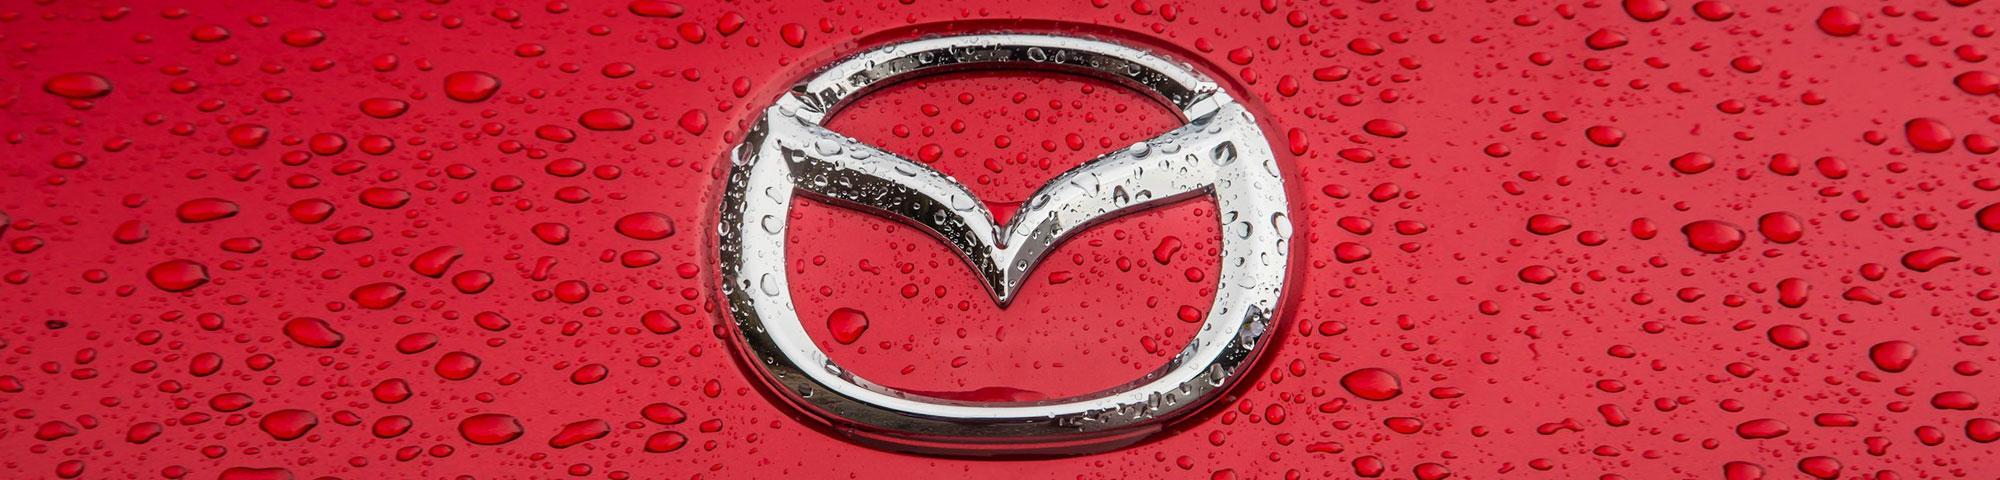 CLMS - Manufacturer - Mazda